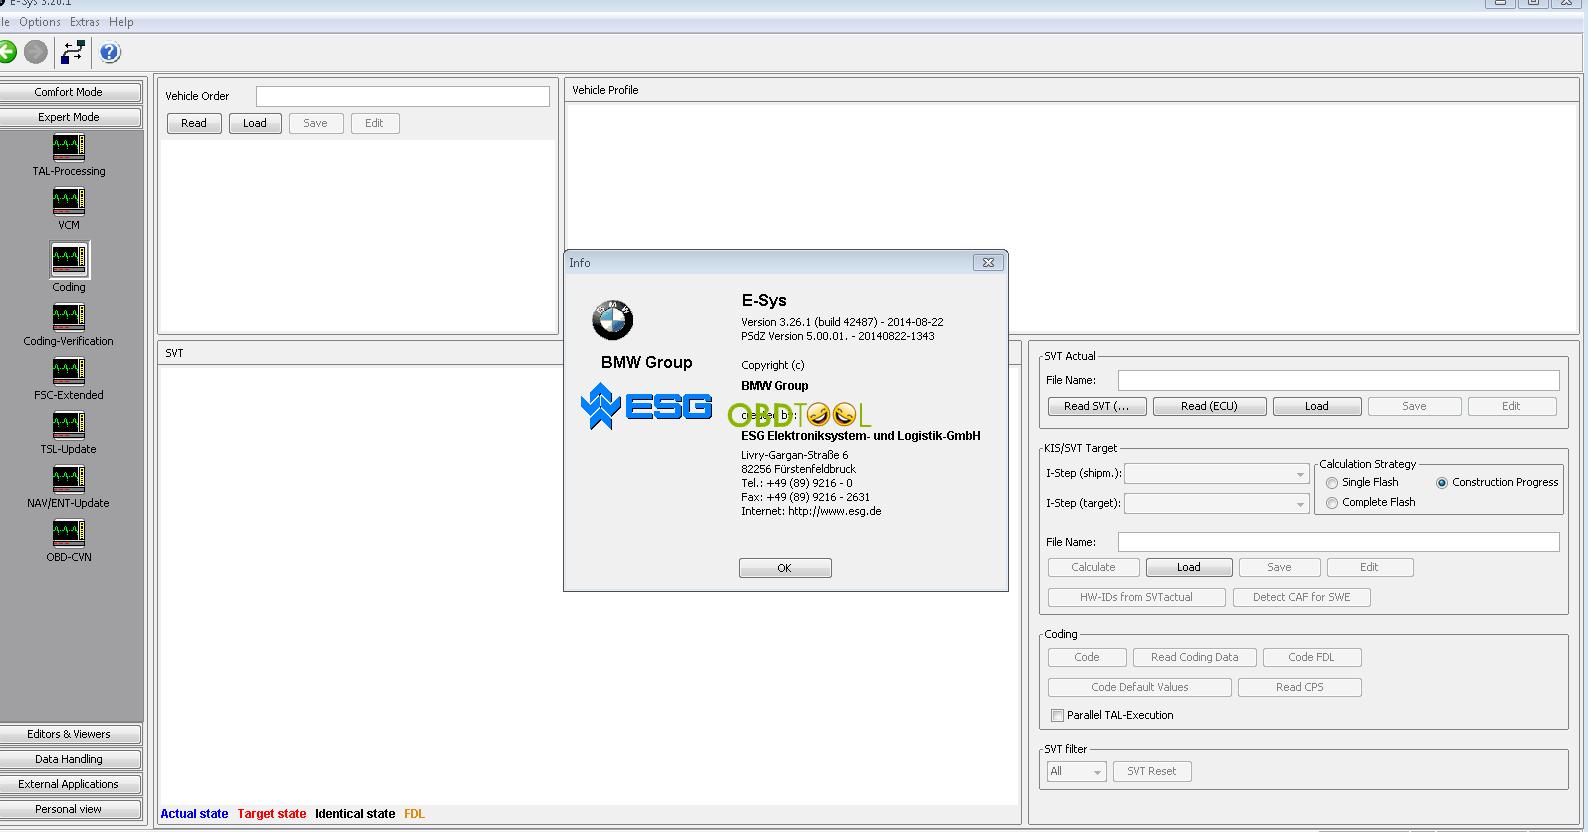 E-Sys-3.26.1 (2)